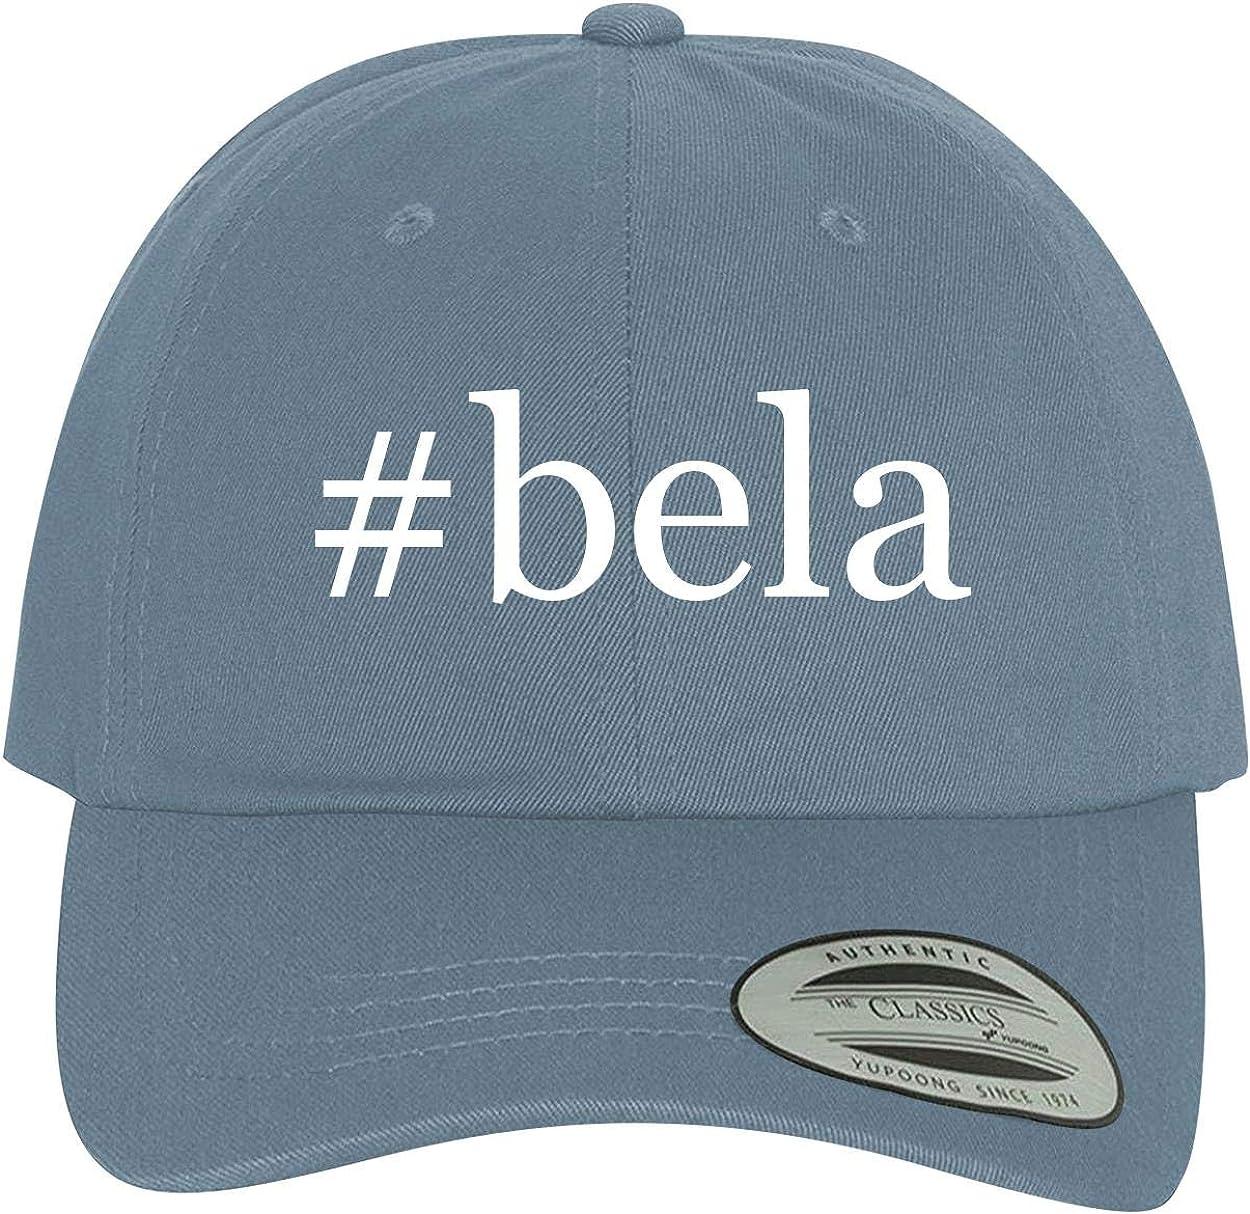 Comfortable Dad Hat Baseball Cap BH Cool Designs #bela